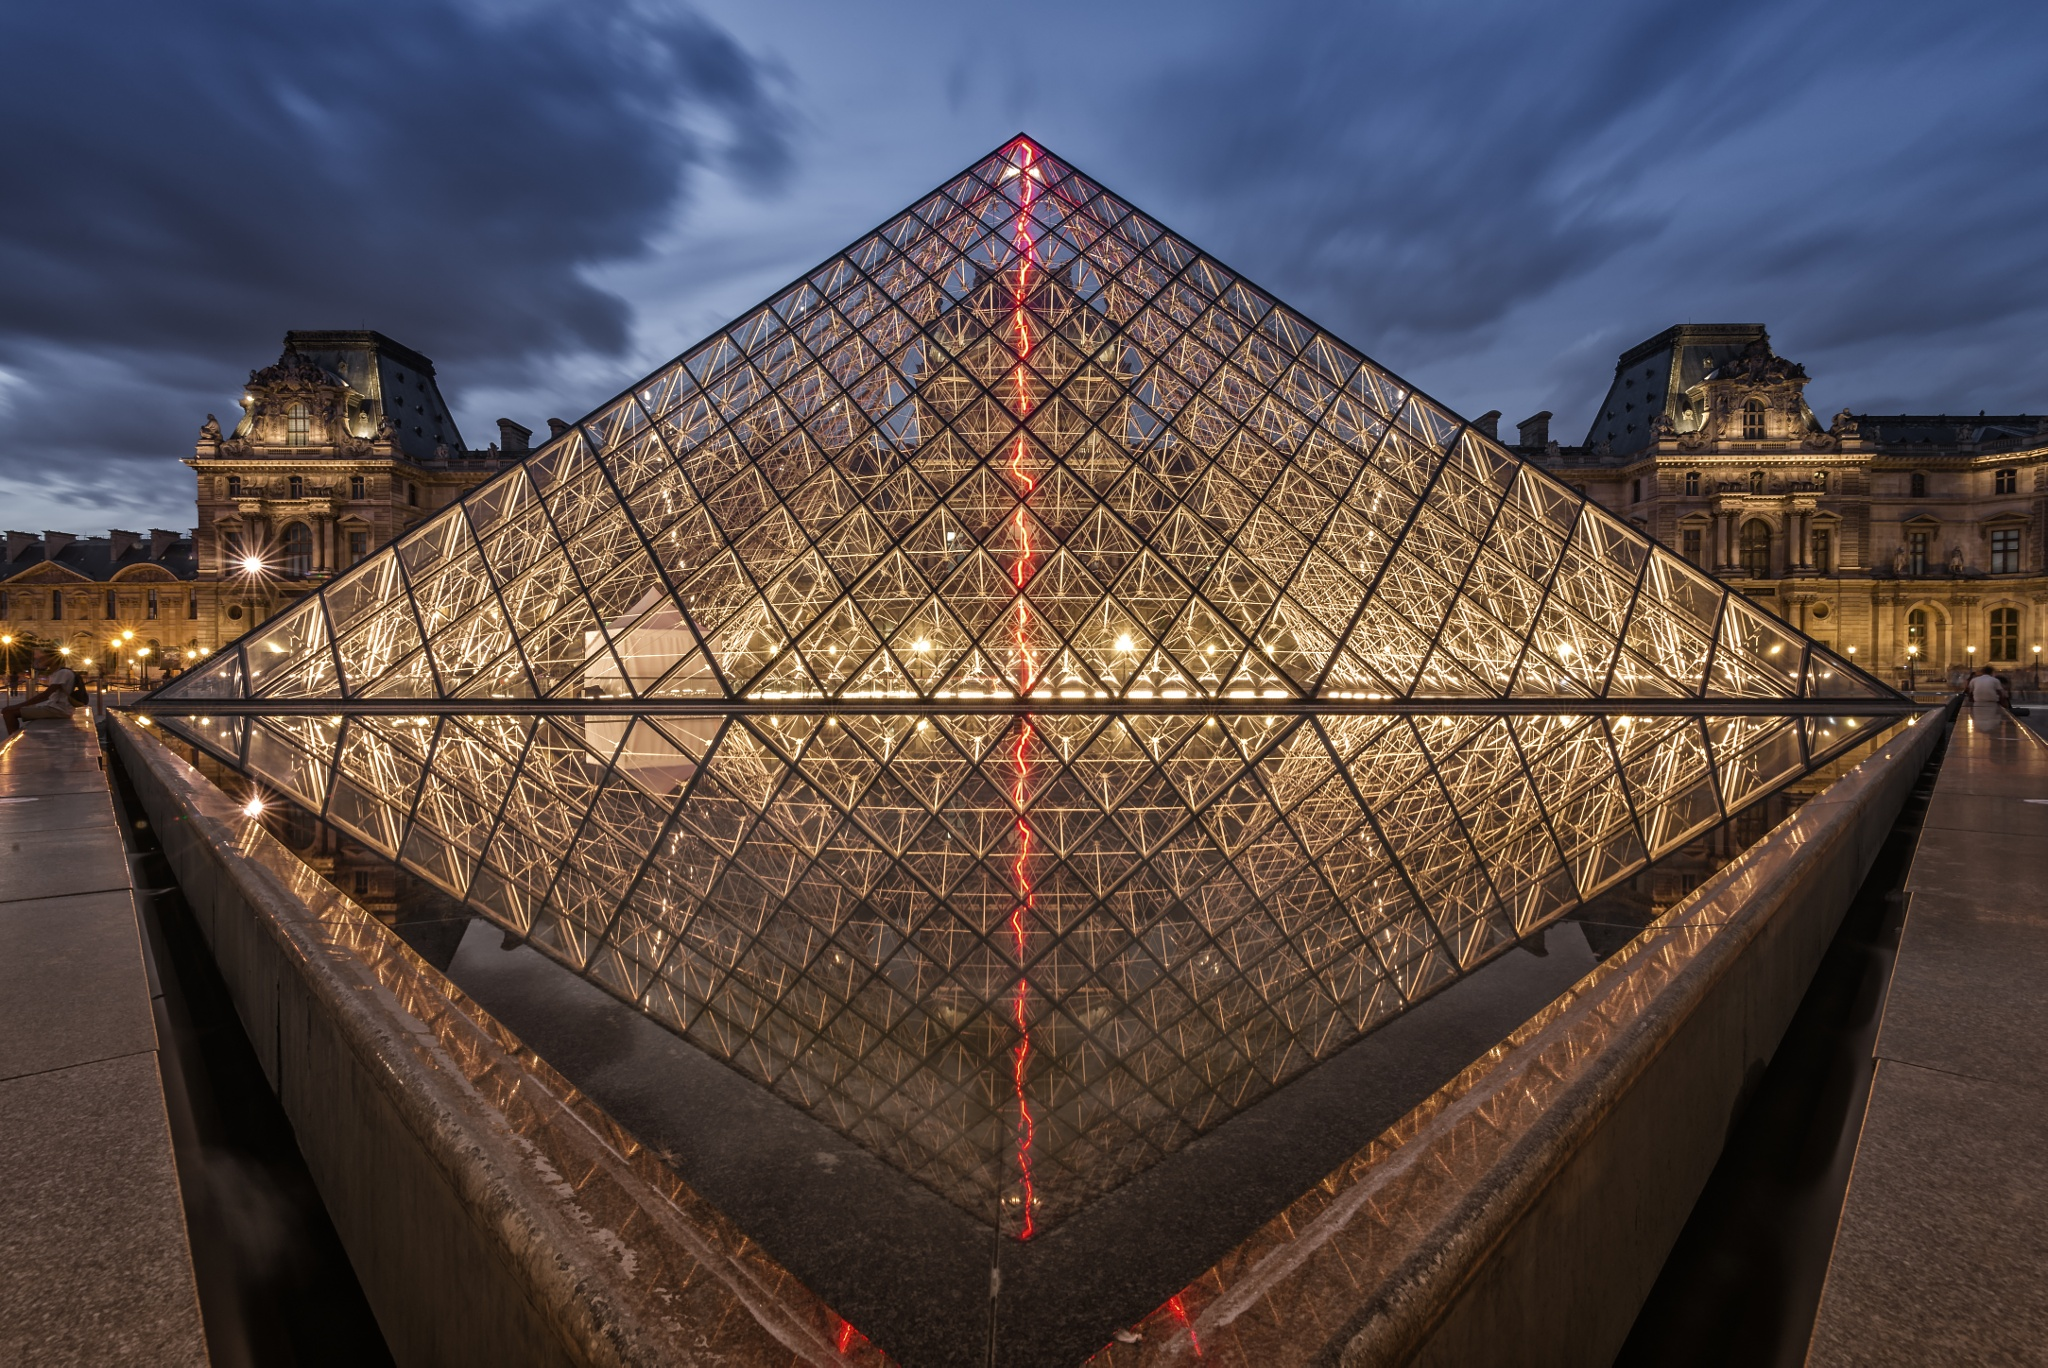 Louvre by piotr j